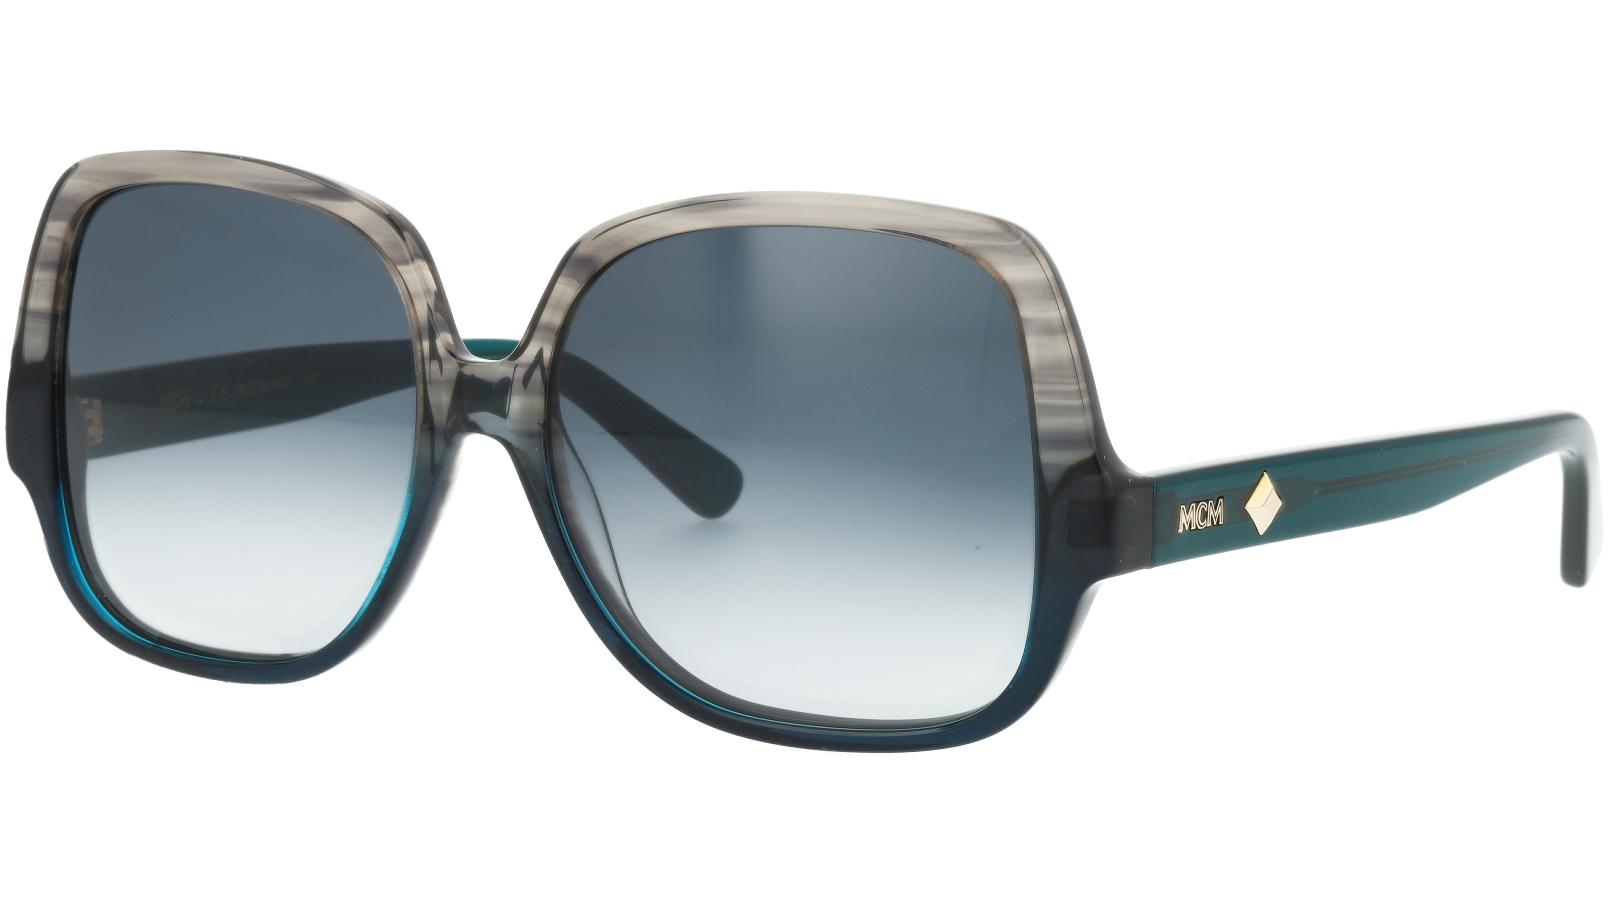 MCM MCM614S 025 58 STIRIPED Sunglasses